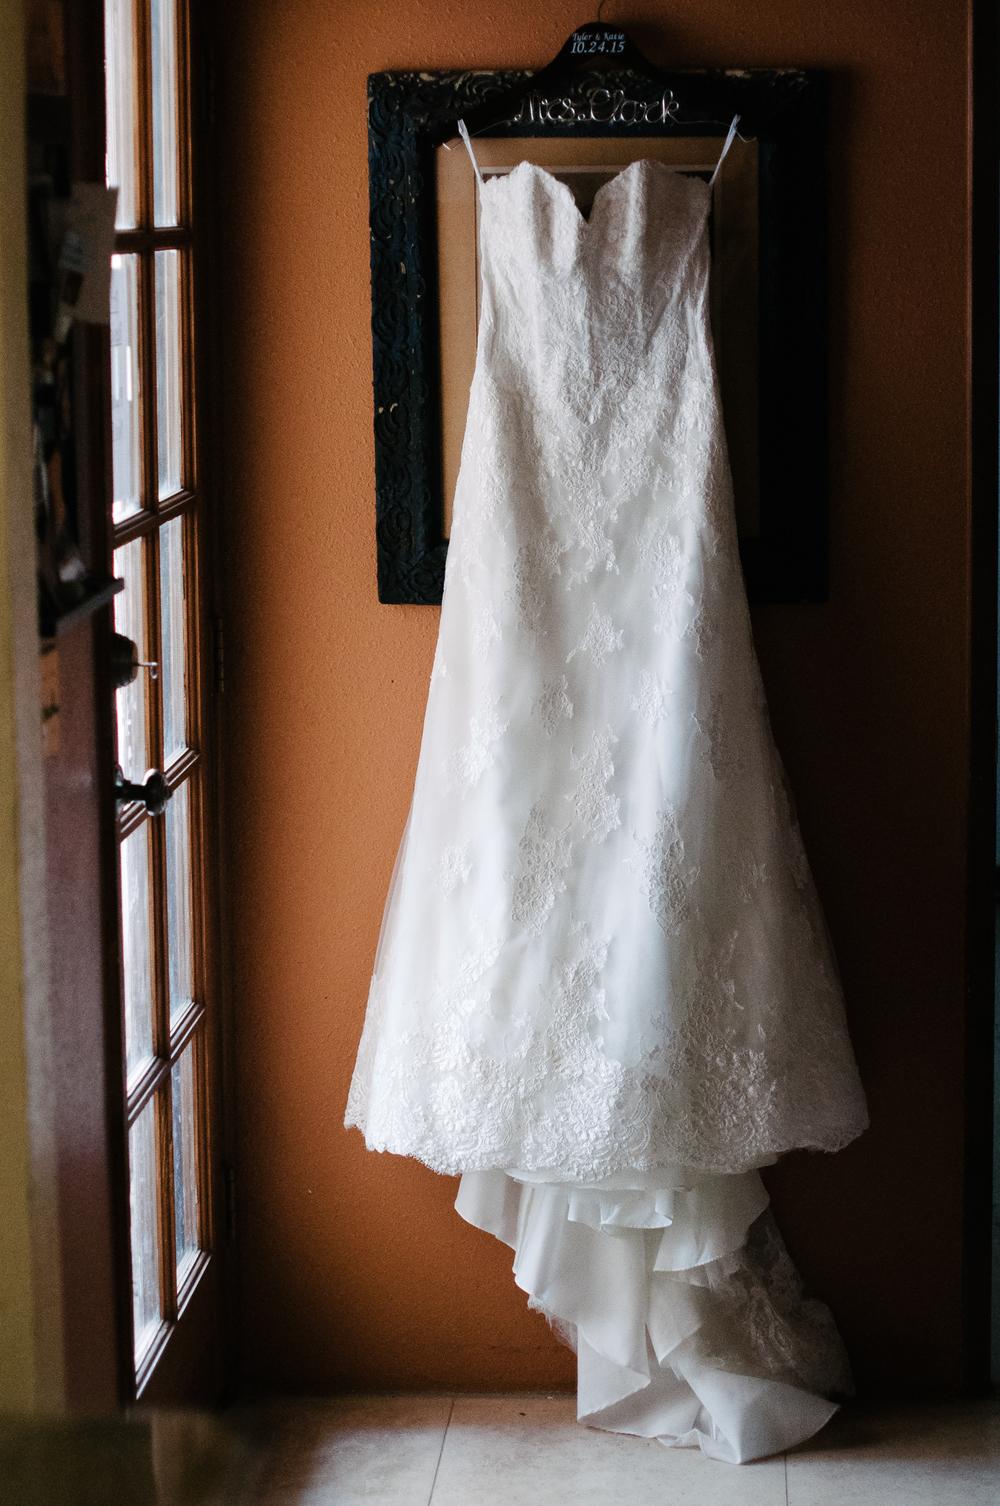 Tehachapi Wedding (13).jpg